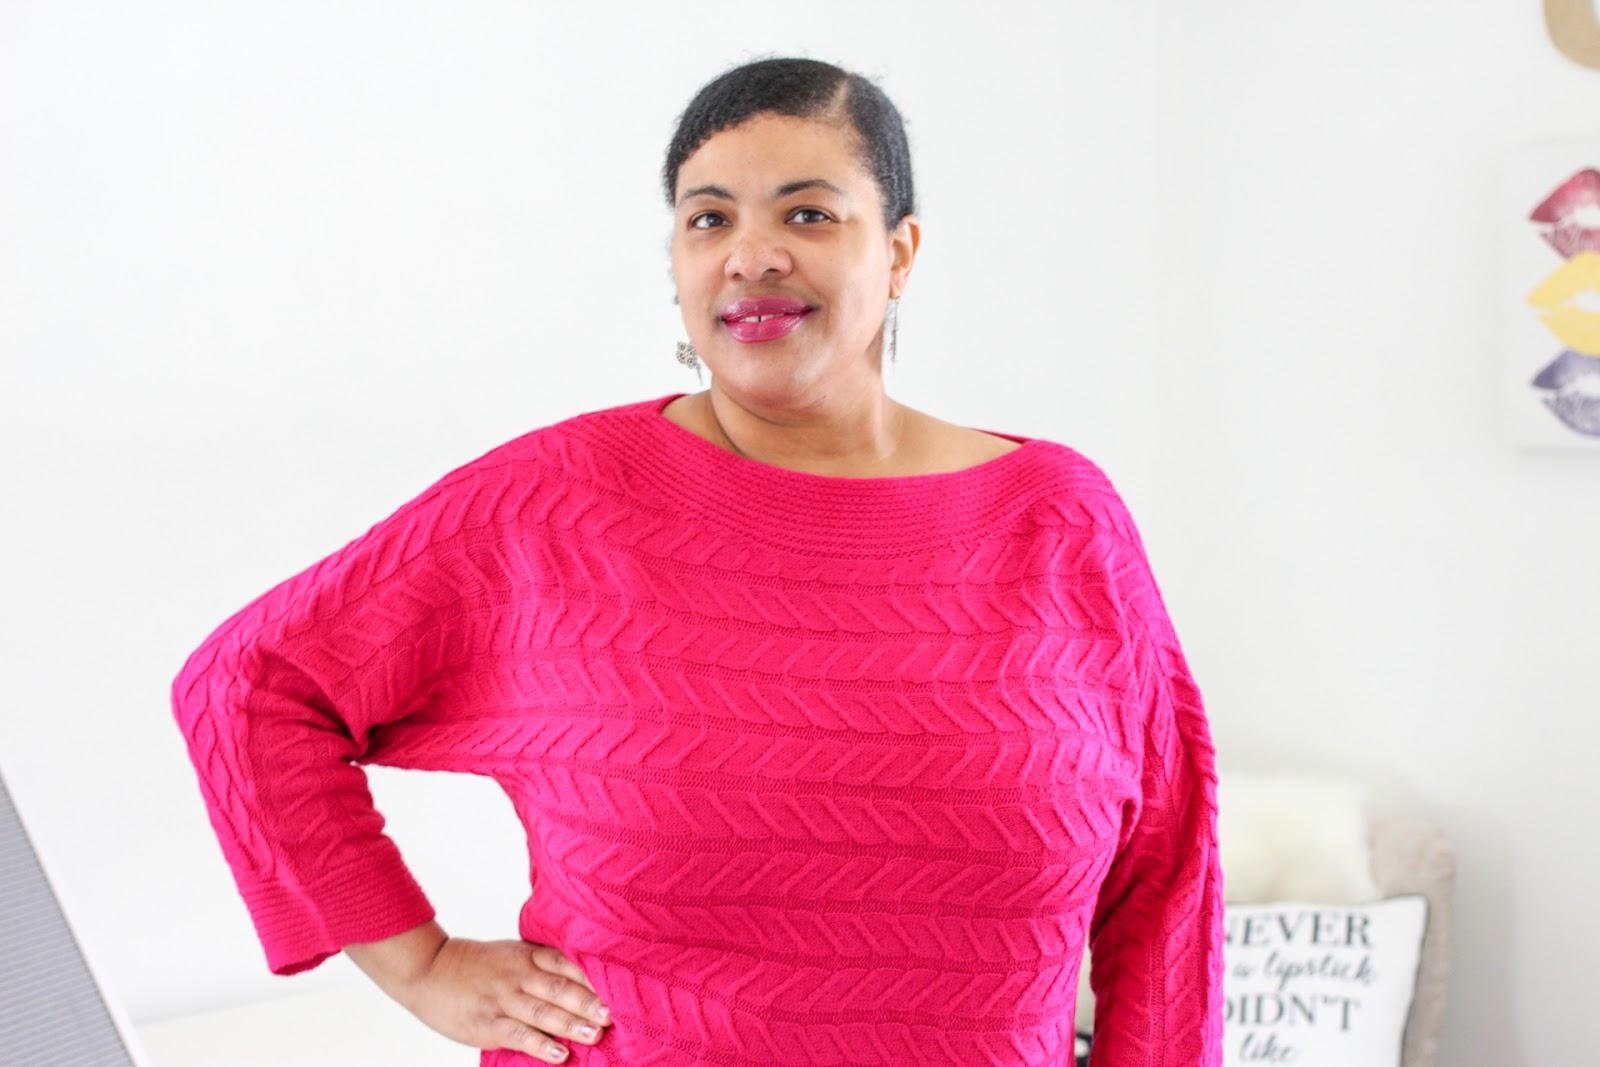 a black woman wearing a hot pink sweater